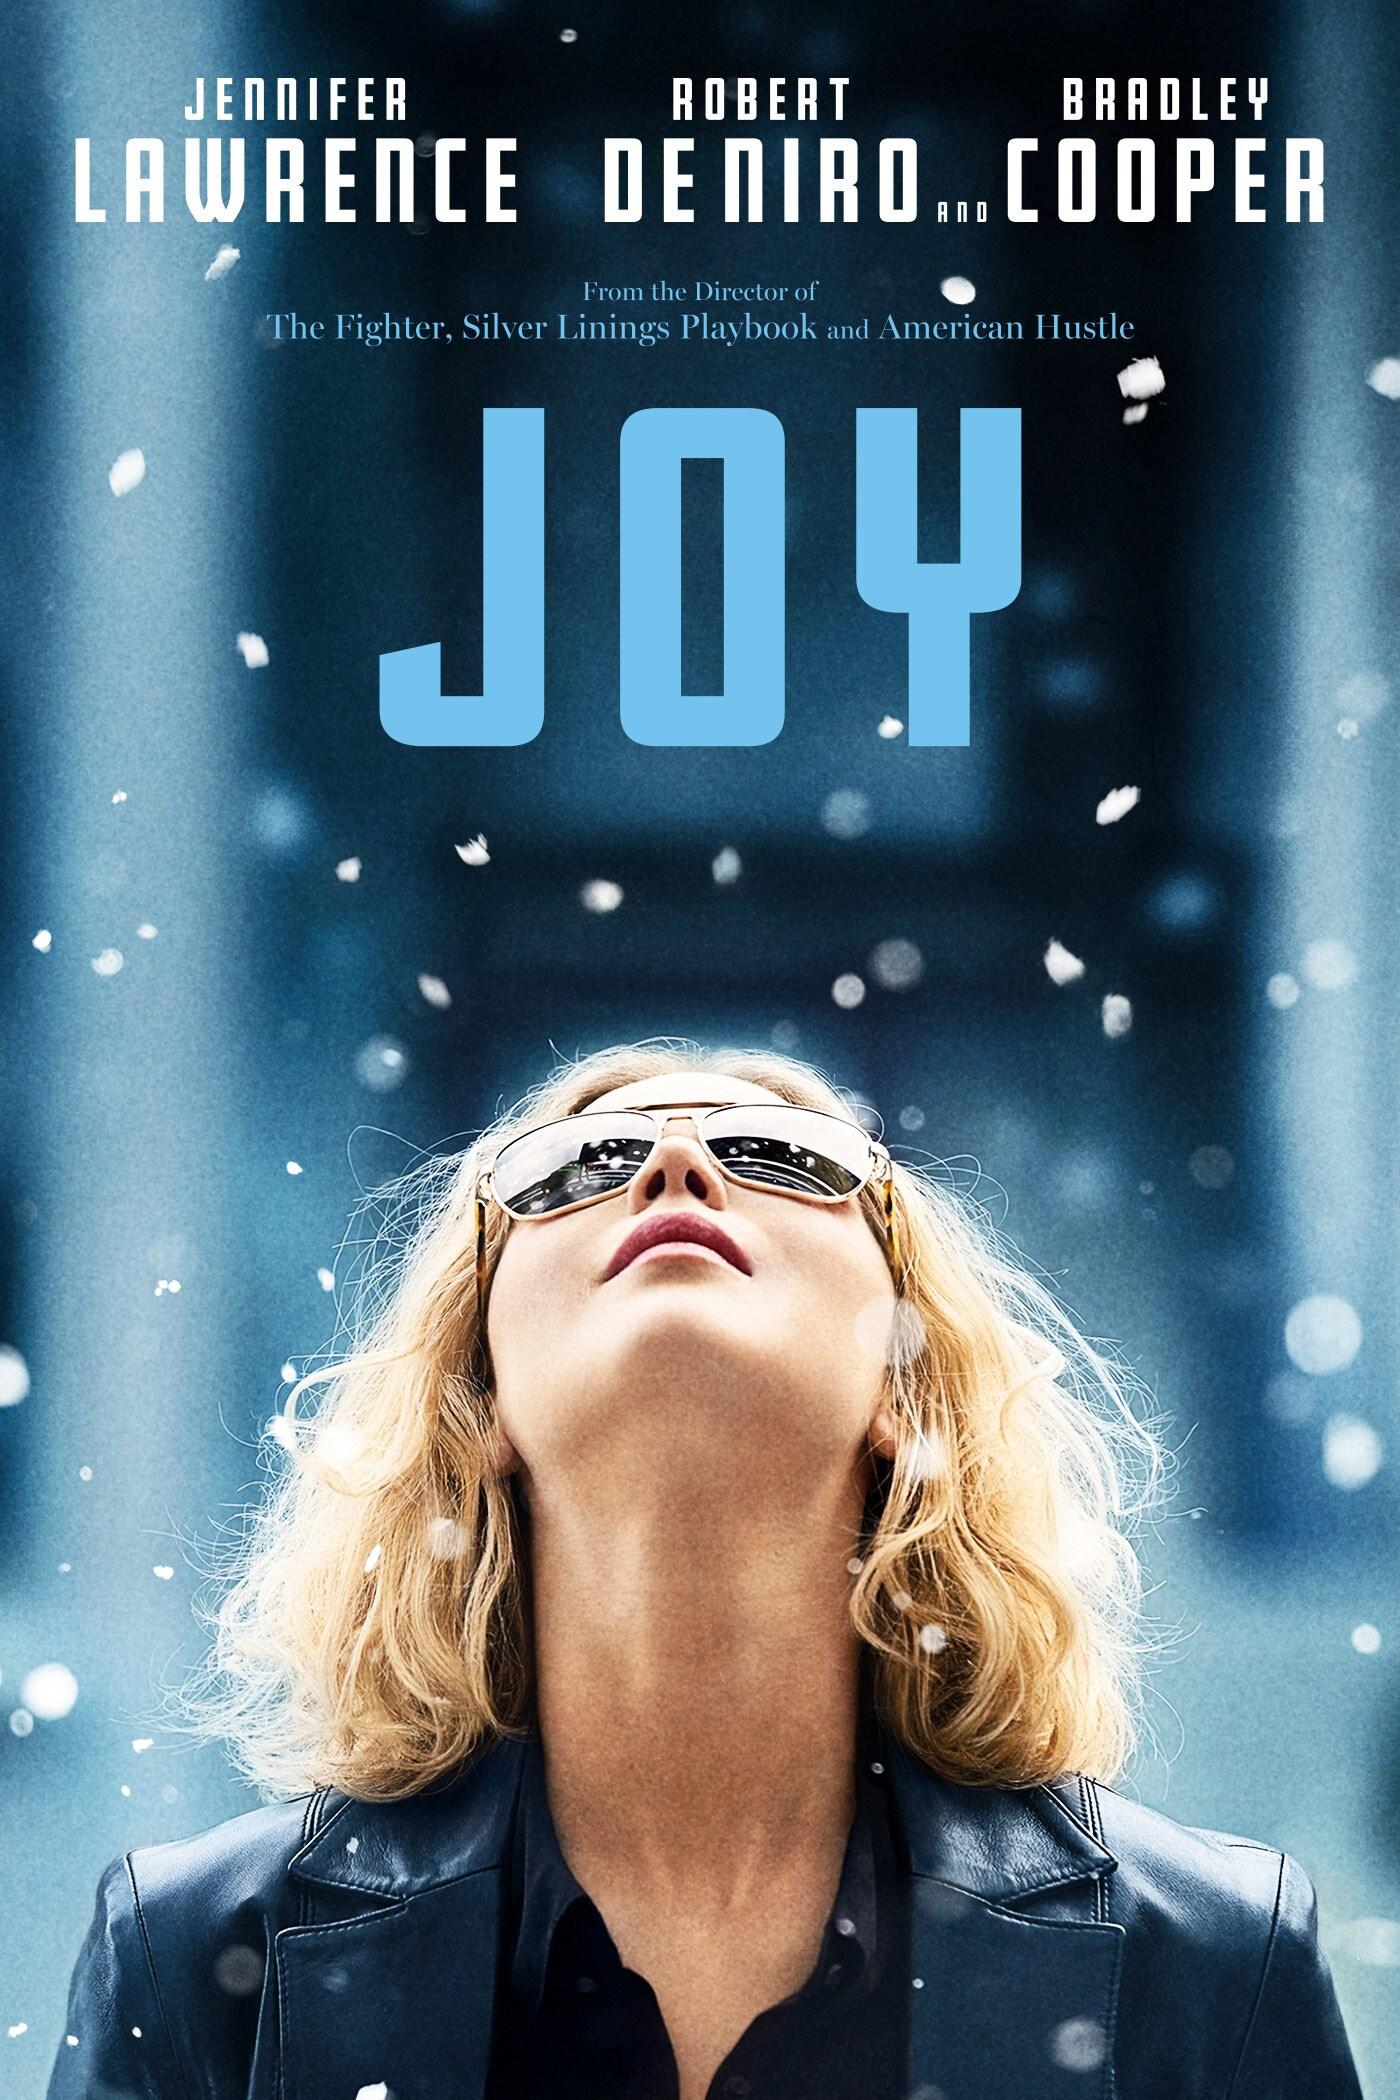 Joy starring Jennifer Laurence, Robert De Niro and Bradley Cooper movie poster